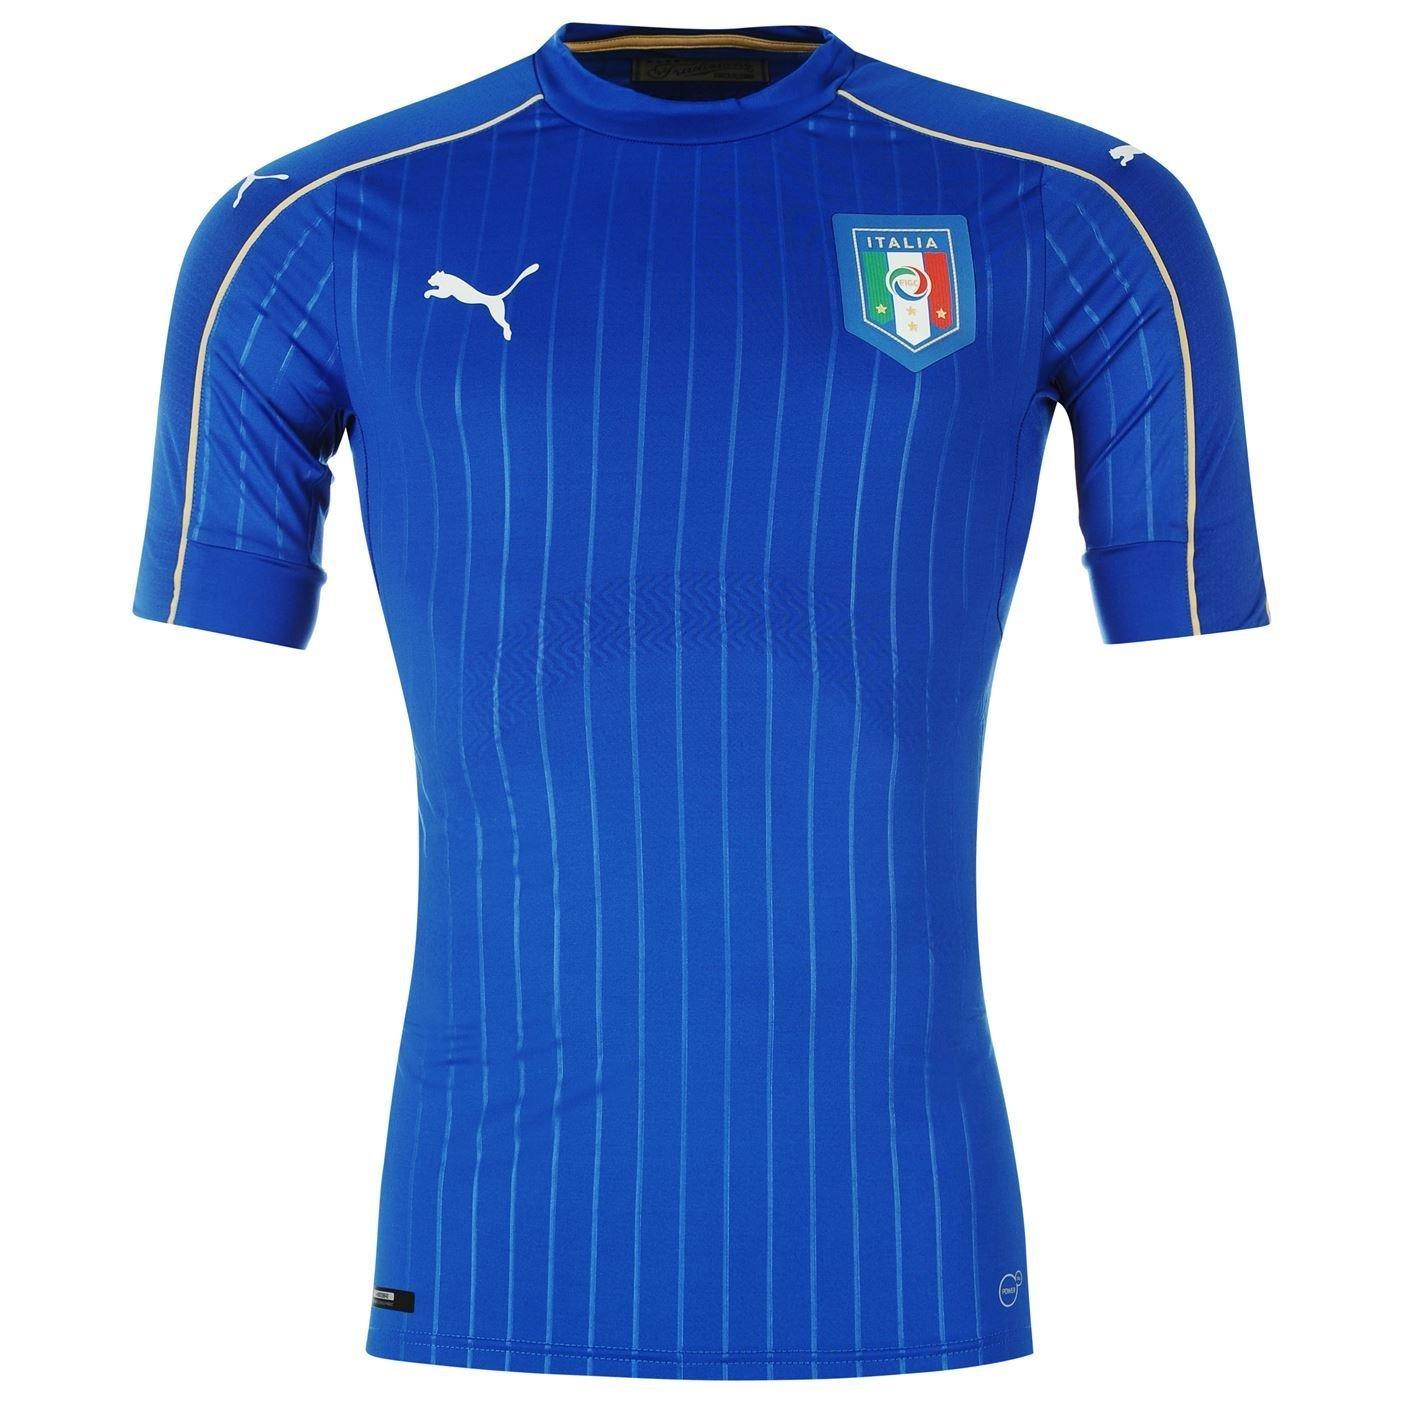 Puma Italy Home Jersey 2016ジュニアブルーサッカーシャツトップ B01GKD9BFA7-8 Years (Small Boys)